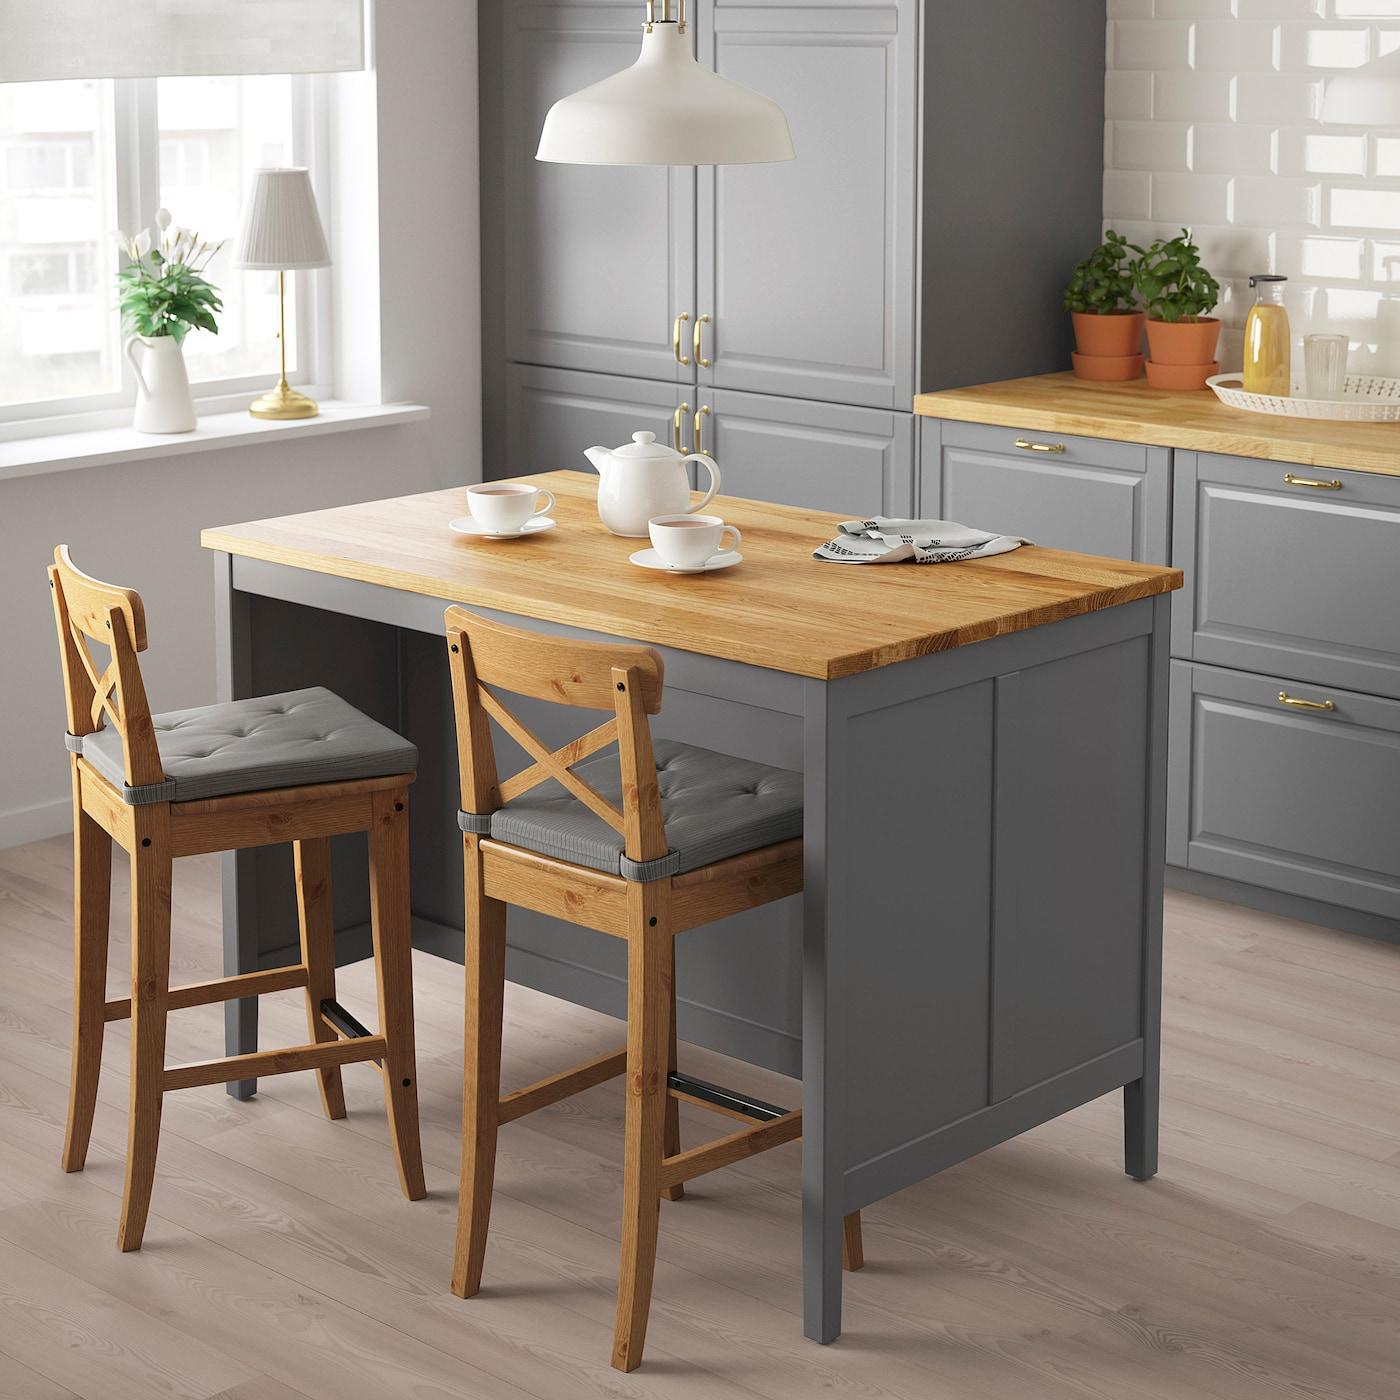 TORNVIKEN kitchen island grey/oak 126 cm 77 cm 90 cm